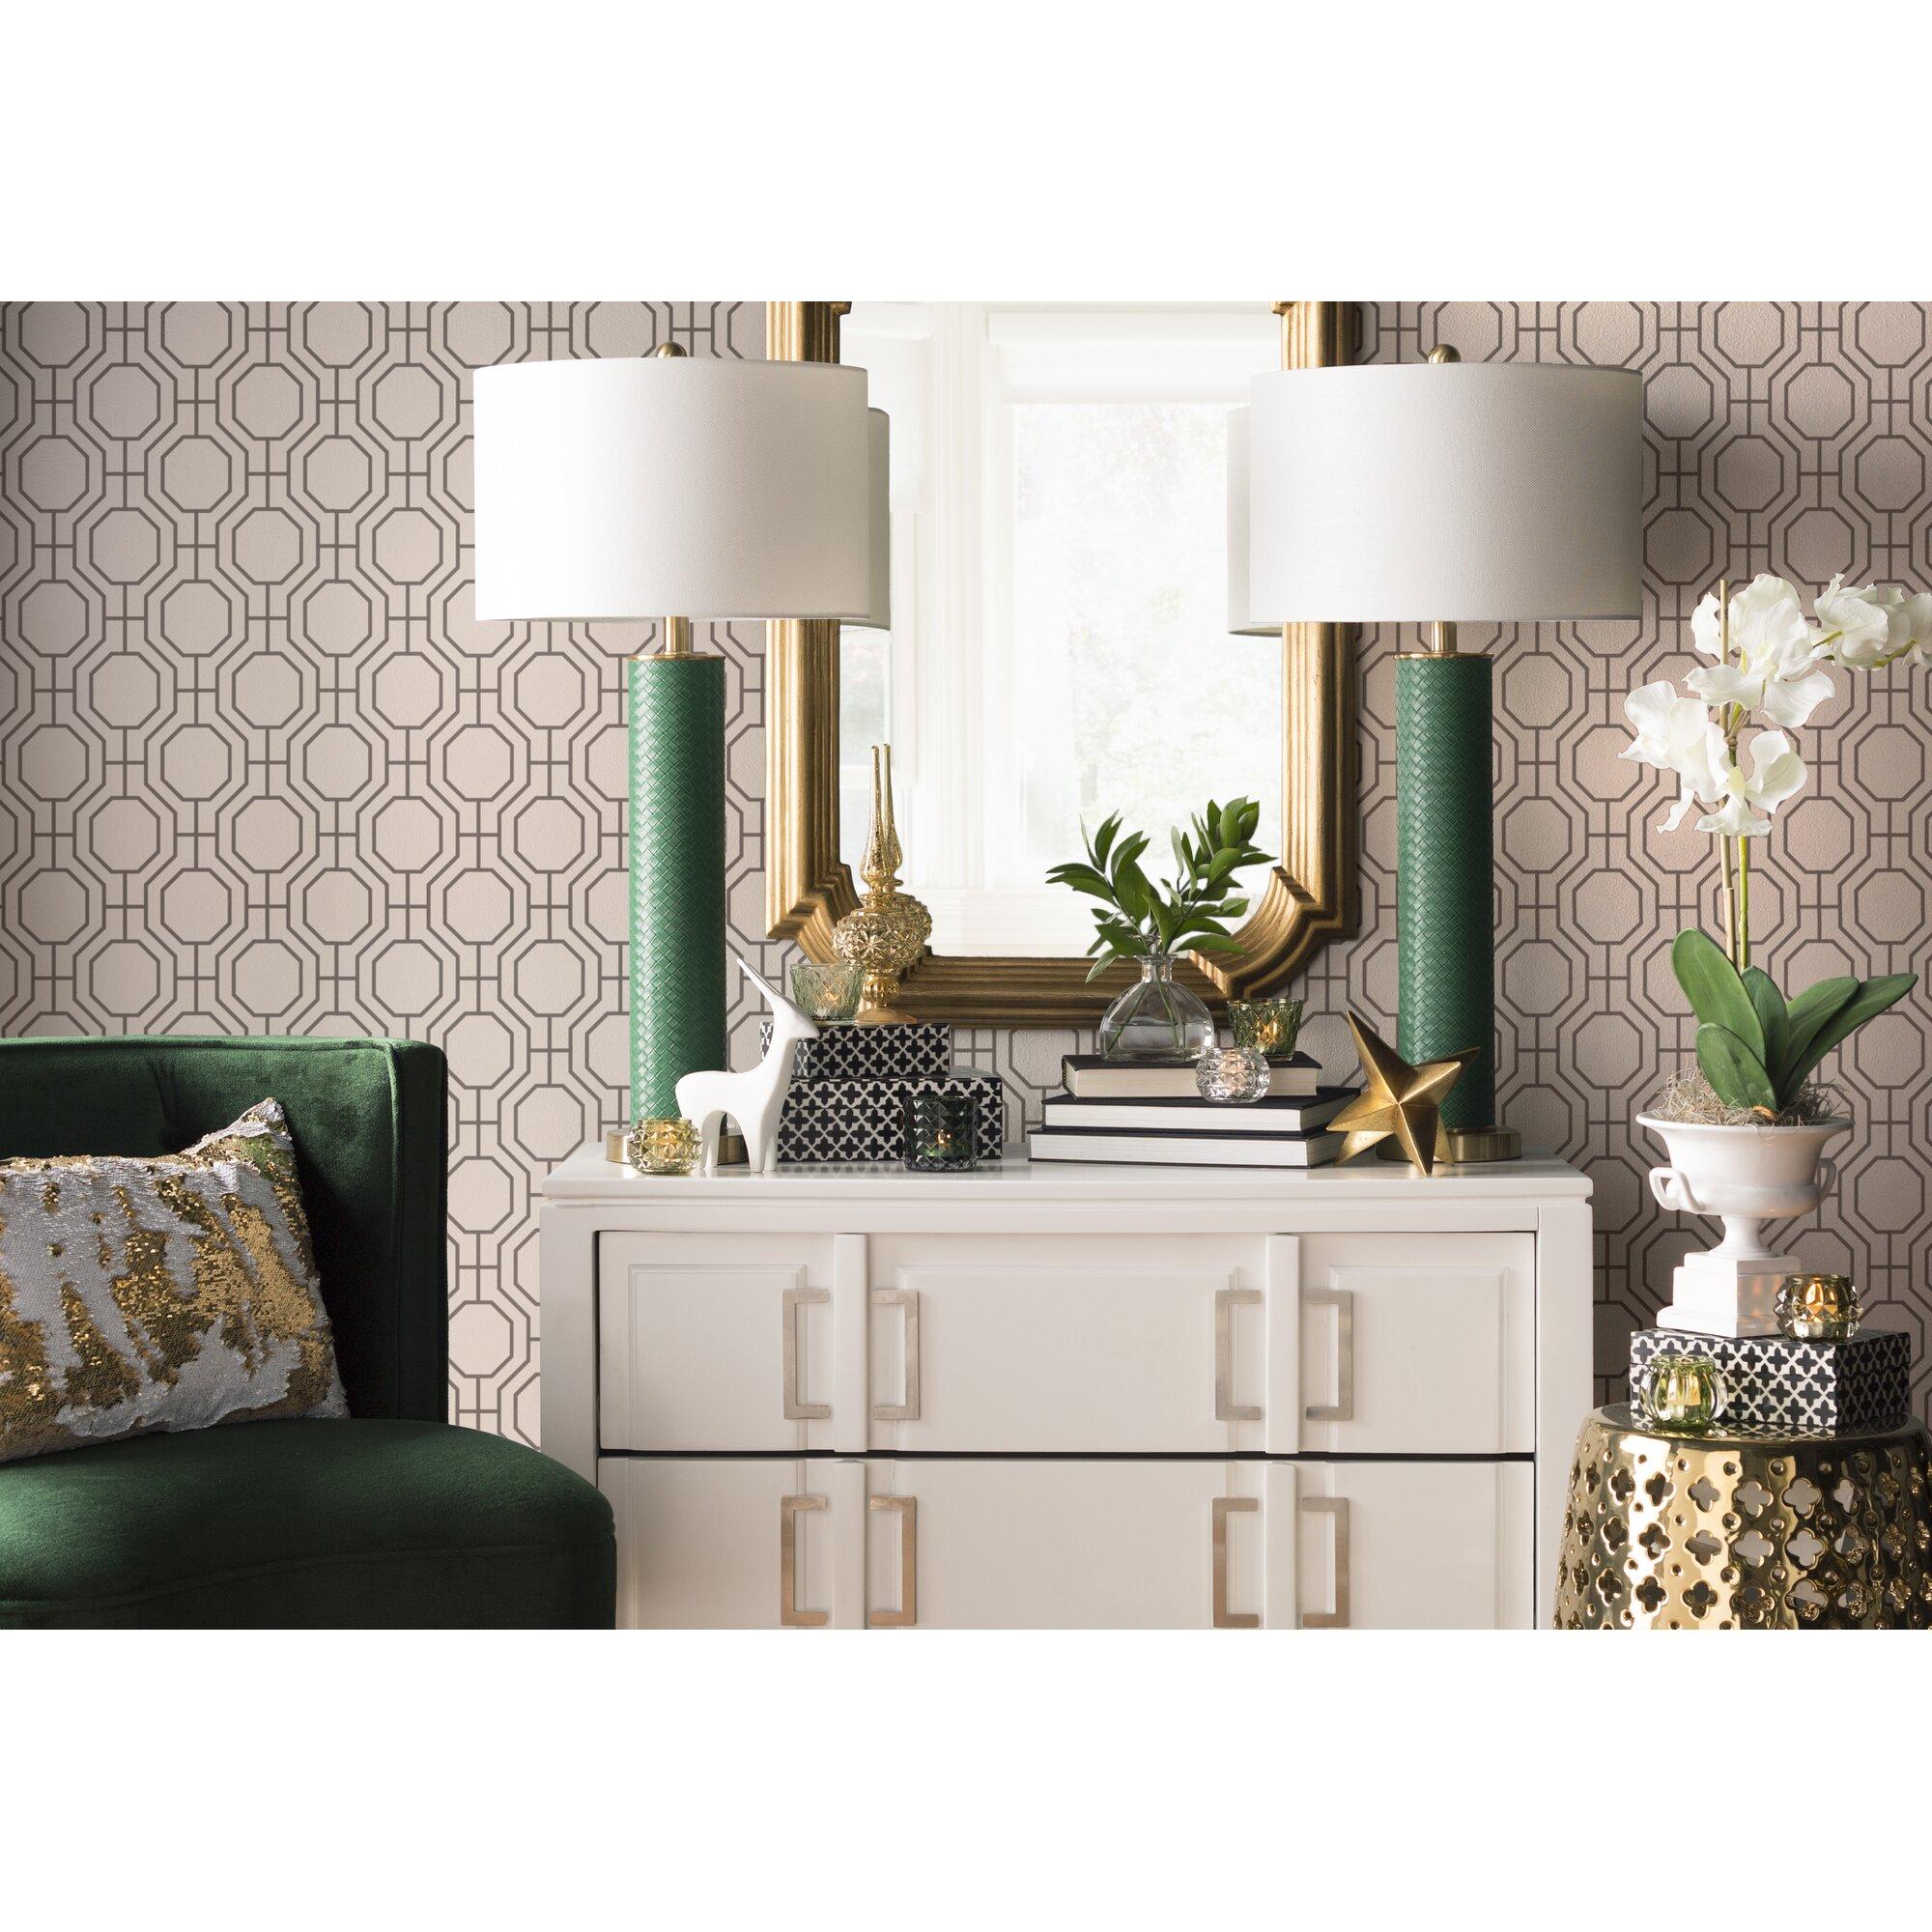 Modern interior wallpaper swatch - Linda Circuit 33 X 20 5 Modern Ironwork Wallpaper Roll